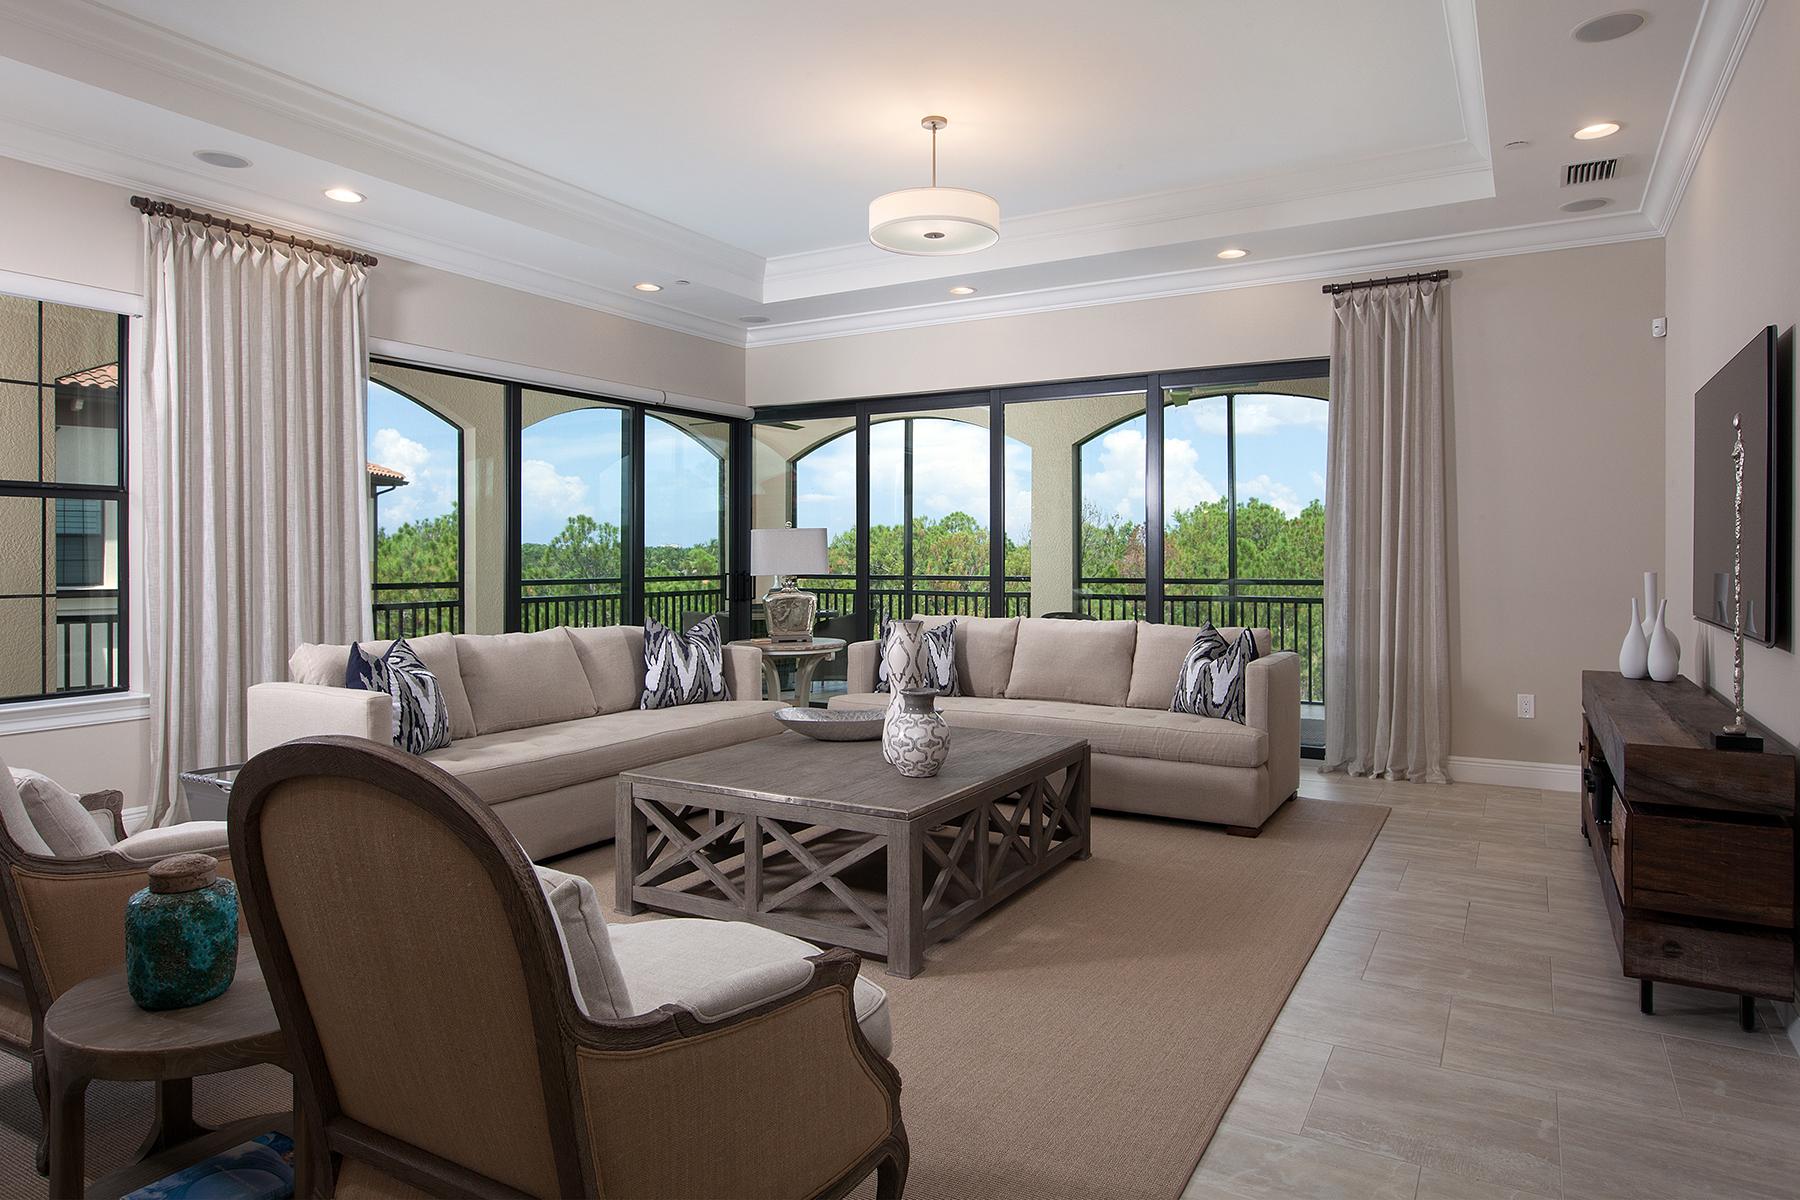 Condominium for Sale at Naples 2733 Tiburon Blvd E 302, Naples, Florida 34109 United States